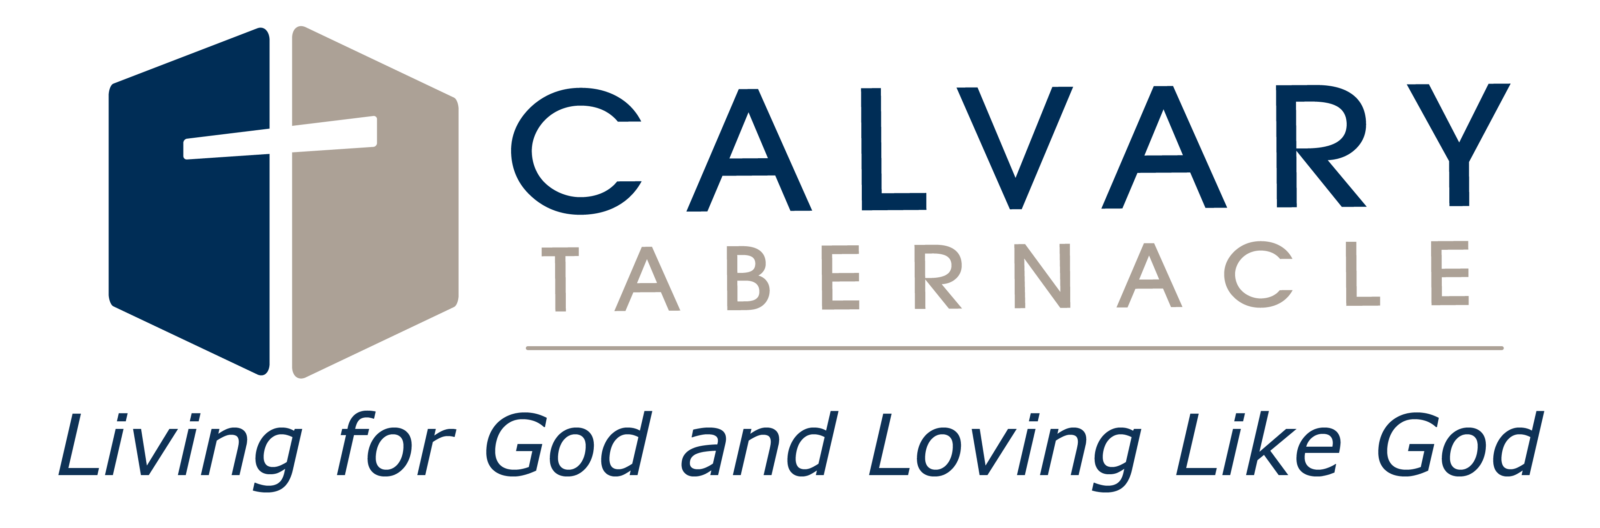 CalvaryTab_Logo_withtagline_noscripture_300dpi